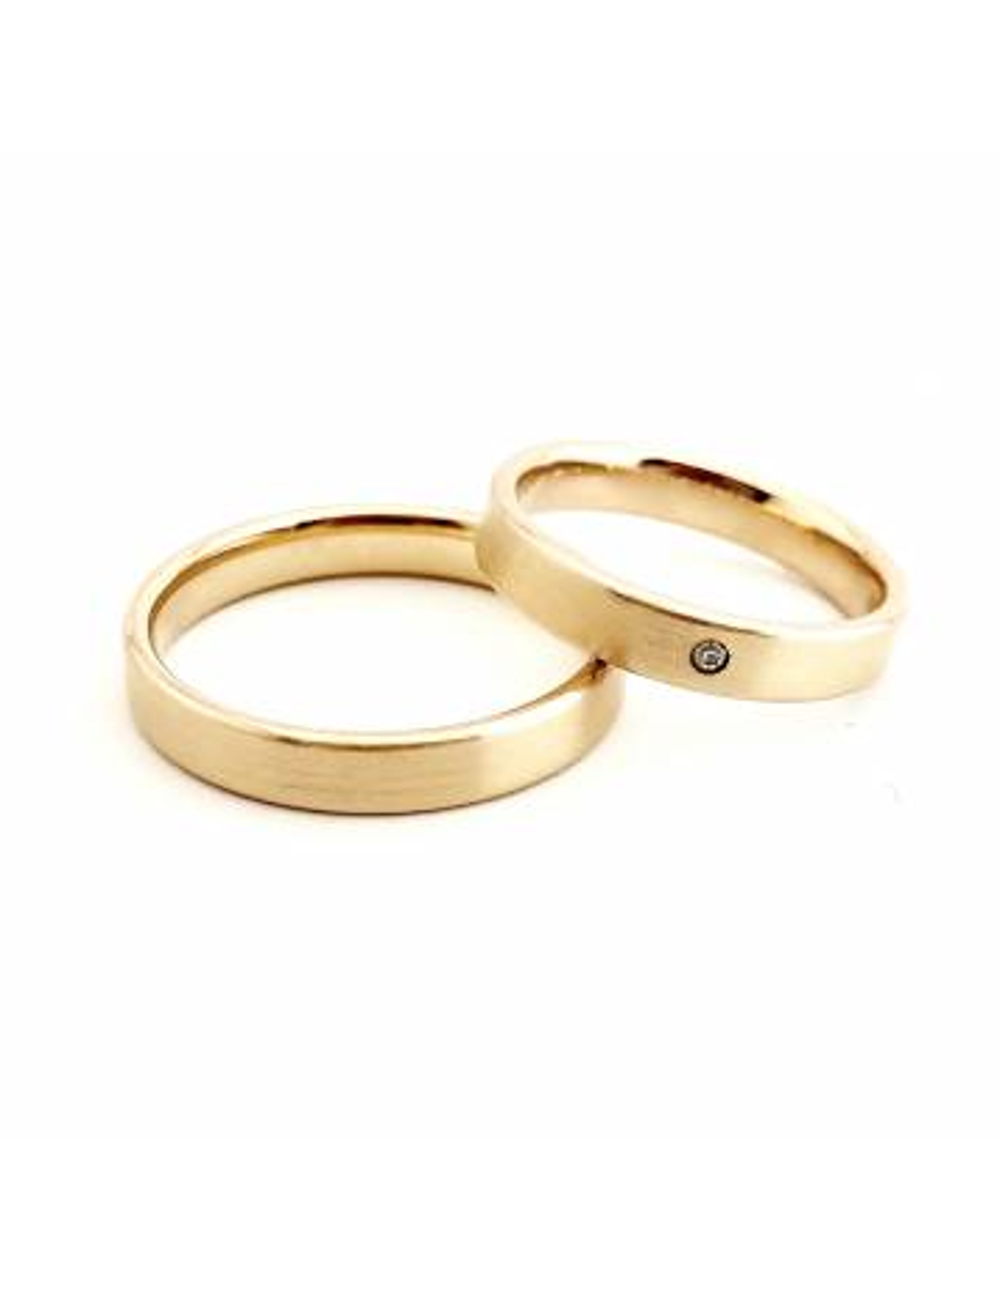 "Vestuvinis žiedas ""Moderni klasika 2020"" 3,5 mm su deimantu GAMYBA"